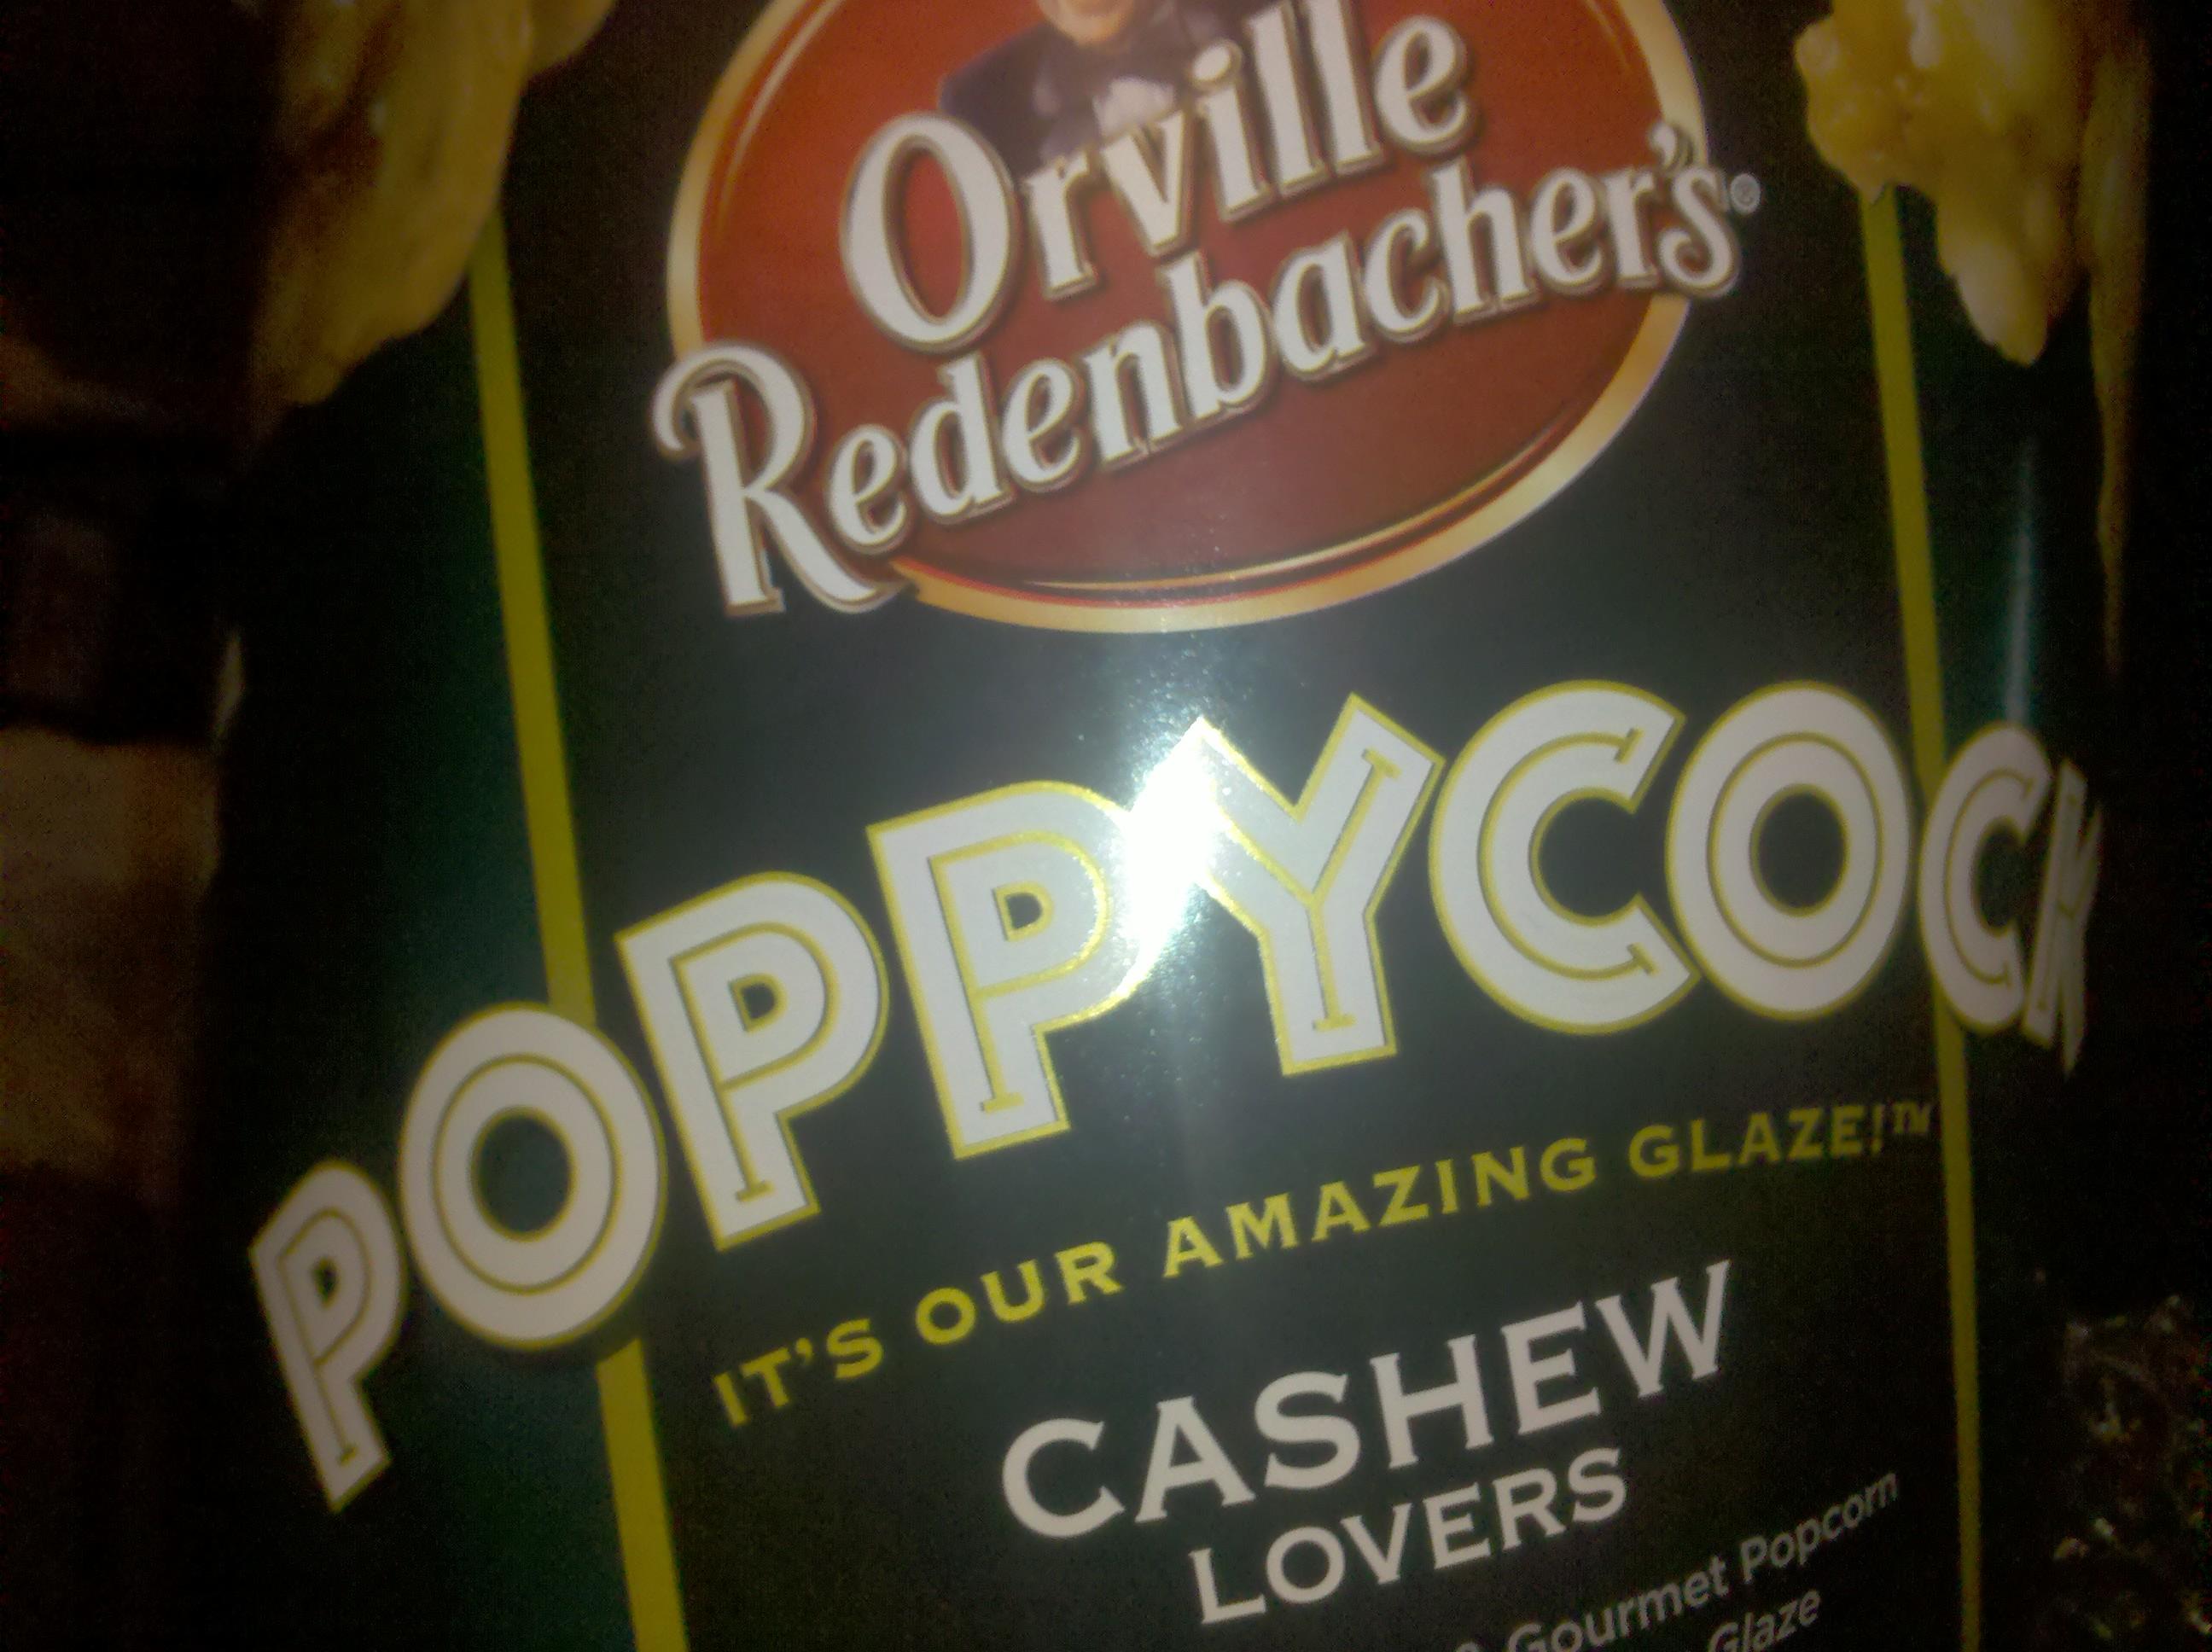 home :: poppycock cashew lovers